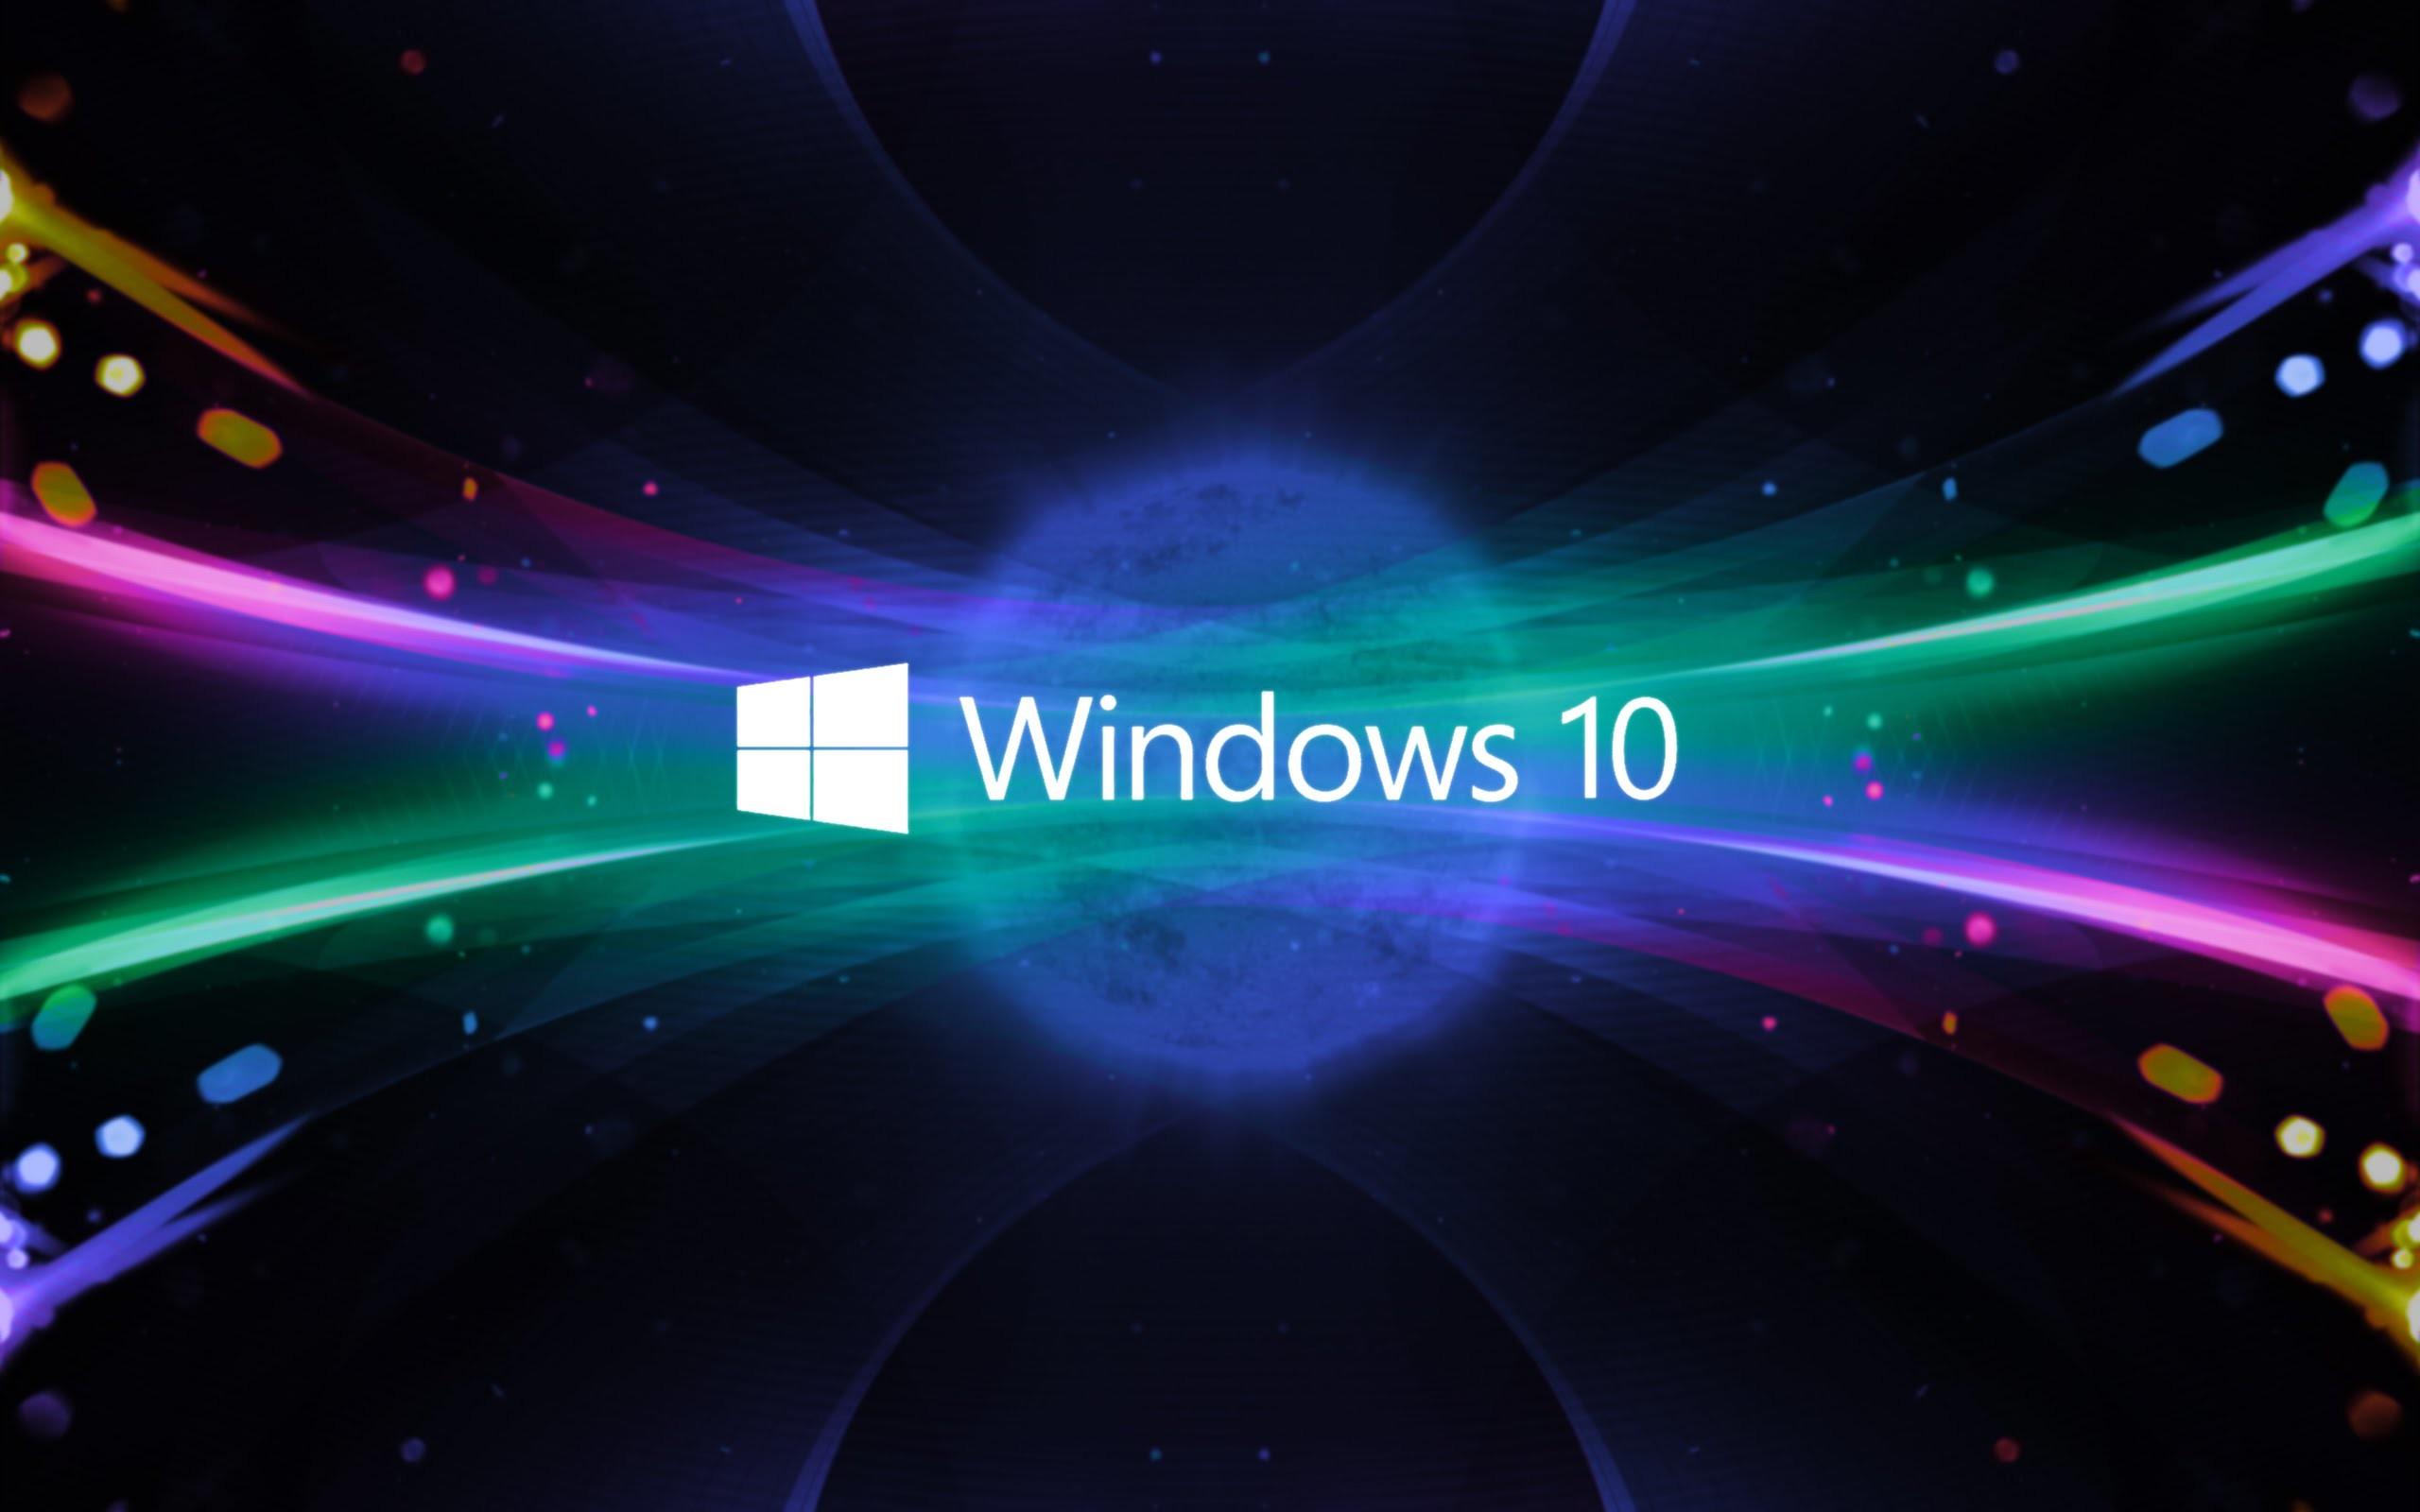 How To Install Animated desktop for Windows 10 September